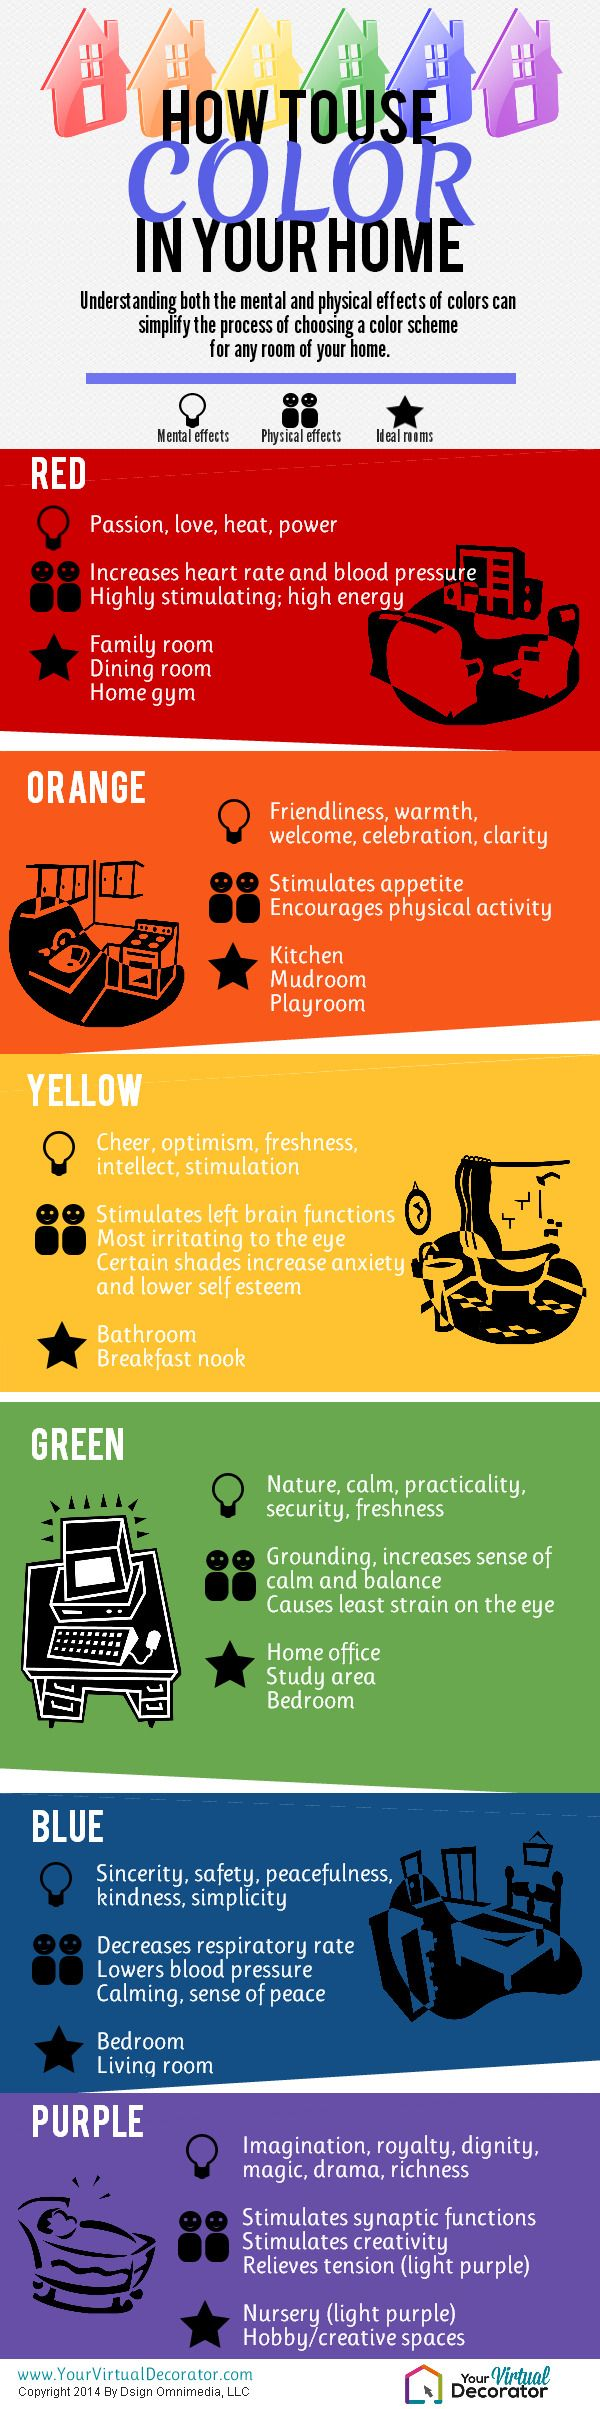 25 best ideas about psychology of color on pinterest - Bedroom Color Psychology